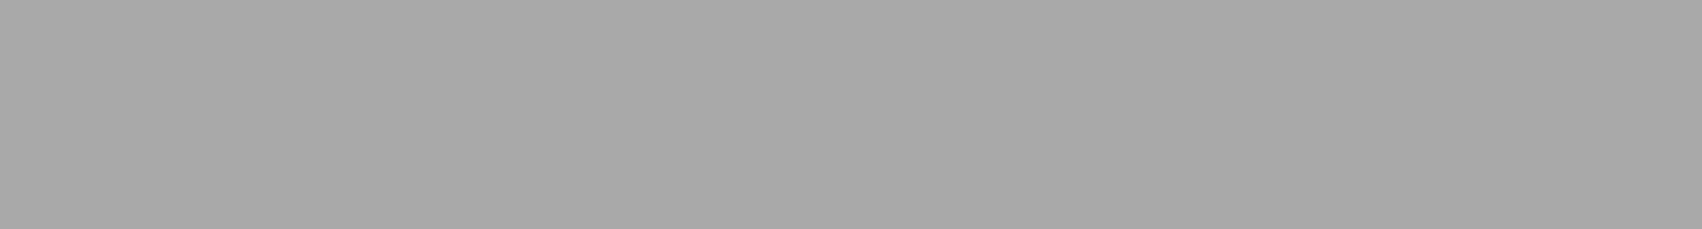 Logos__0024_bto.png